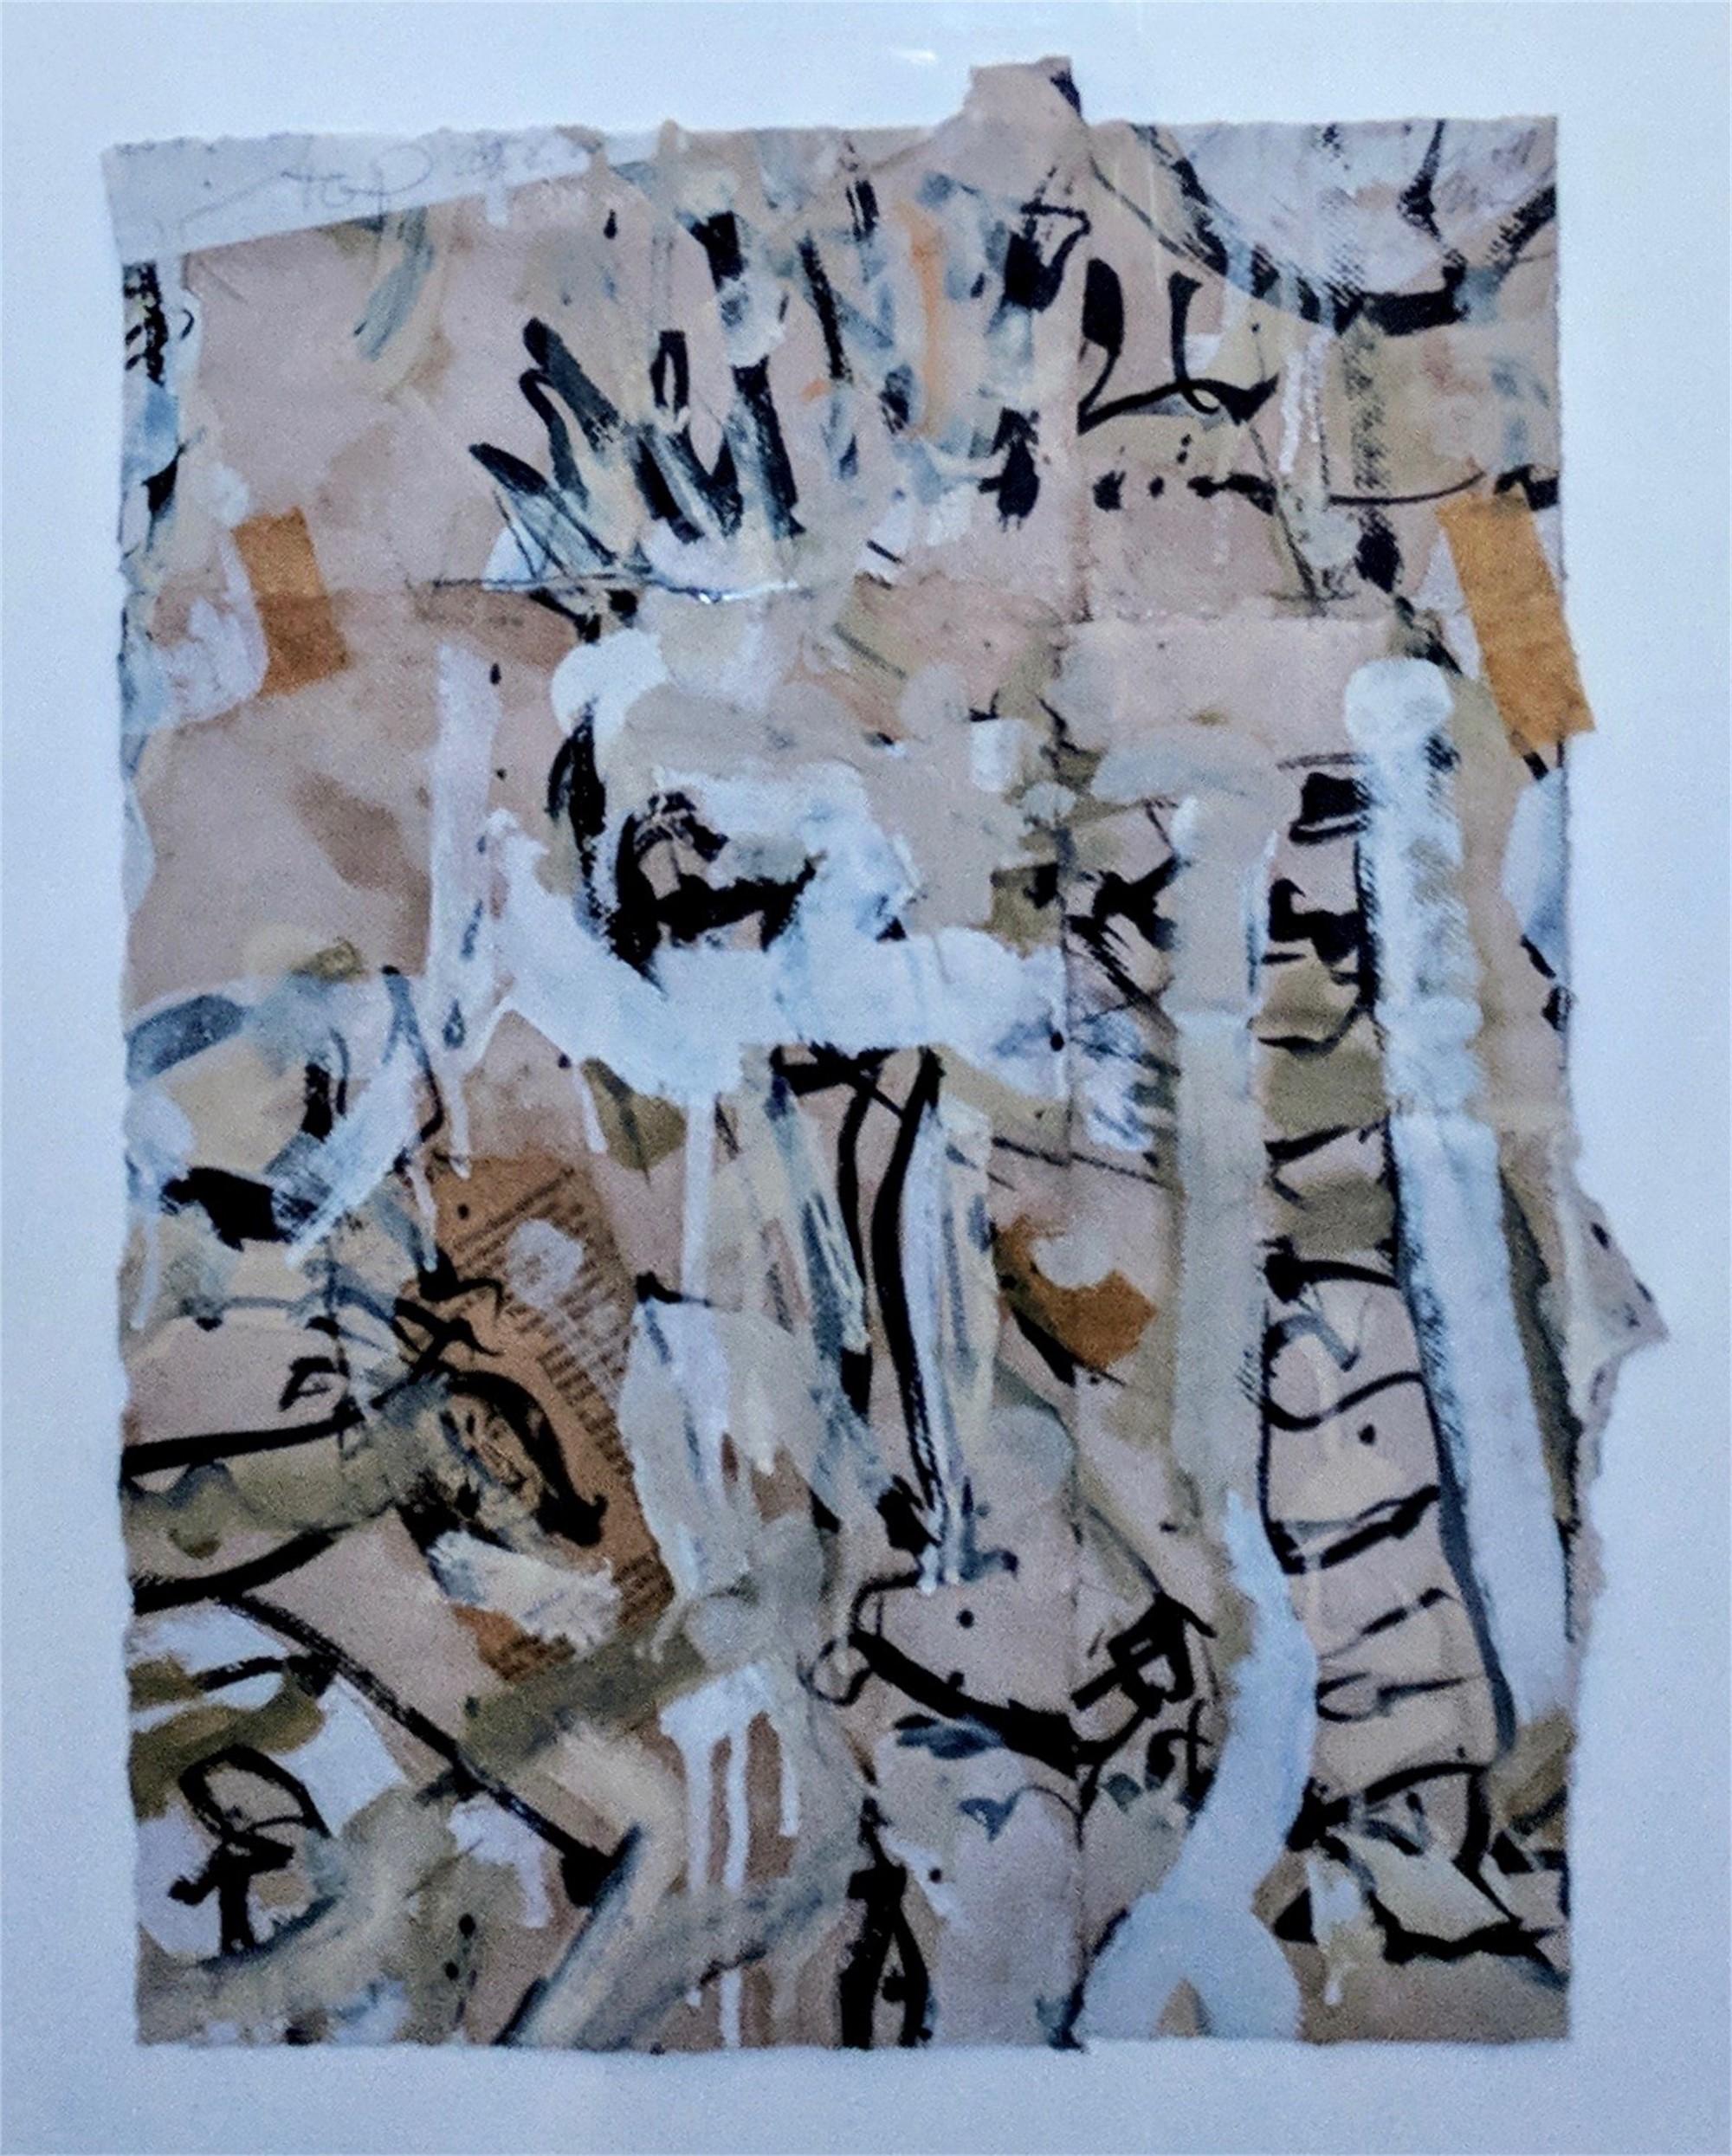 Untitled by Jan Frank